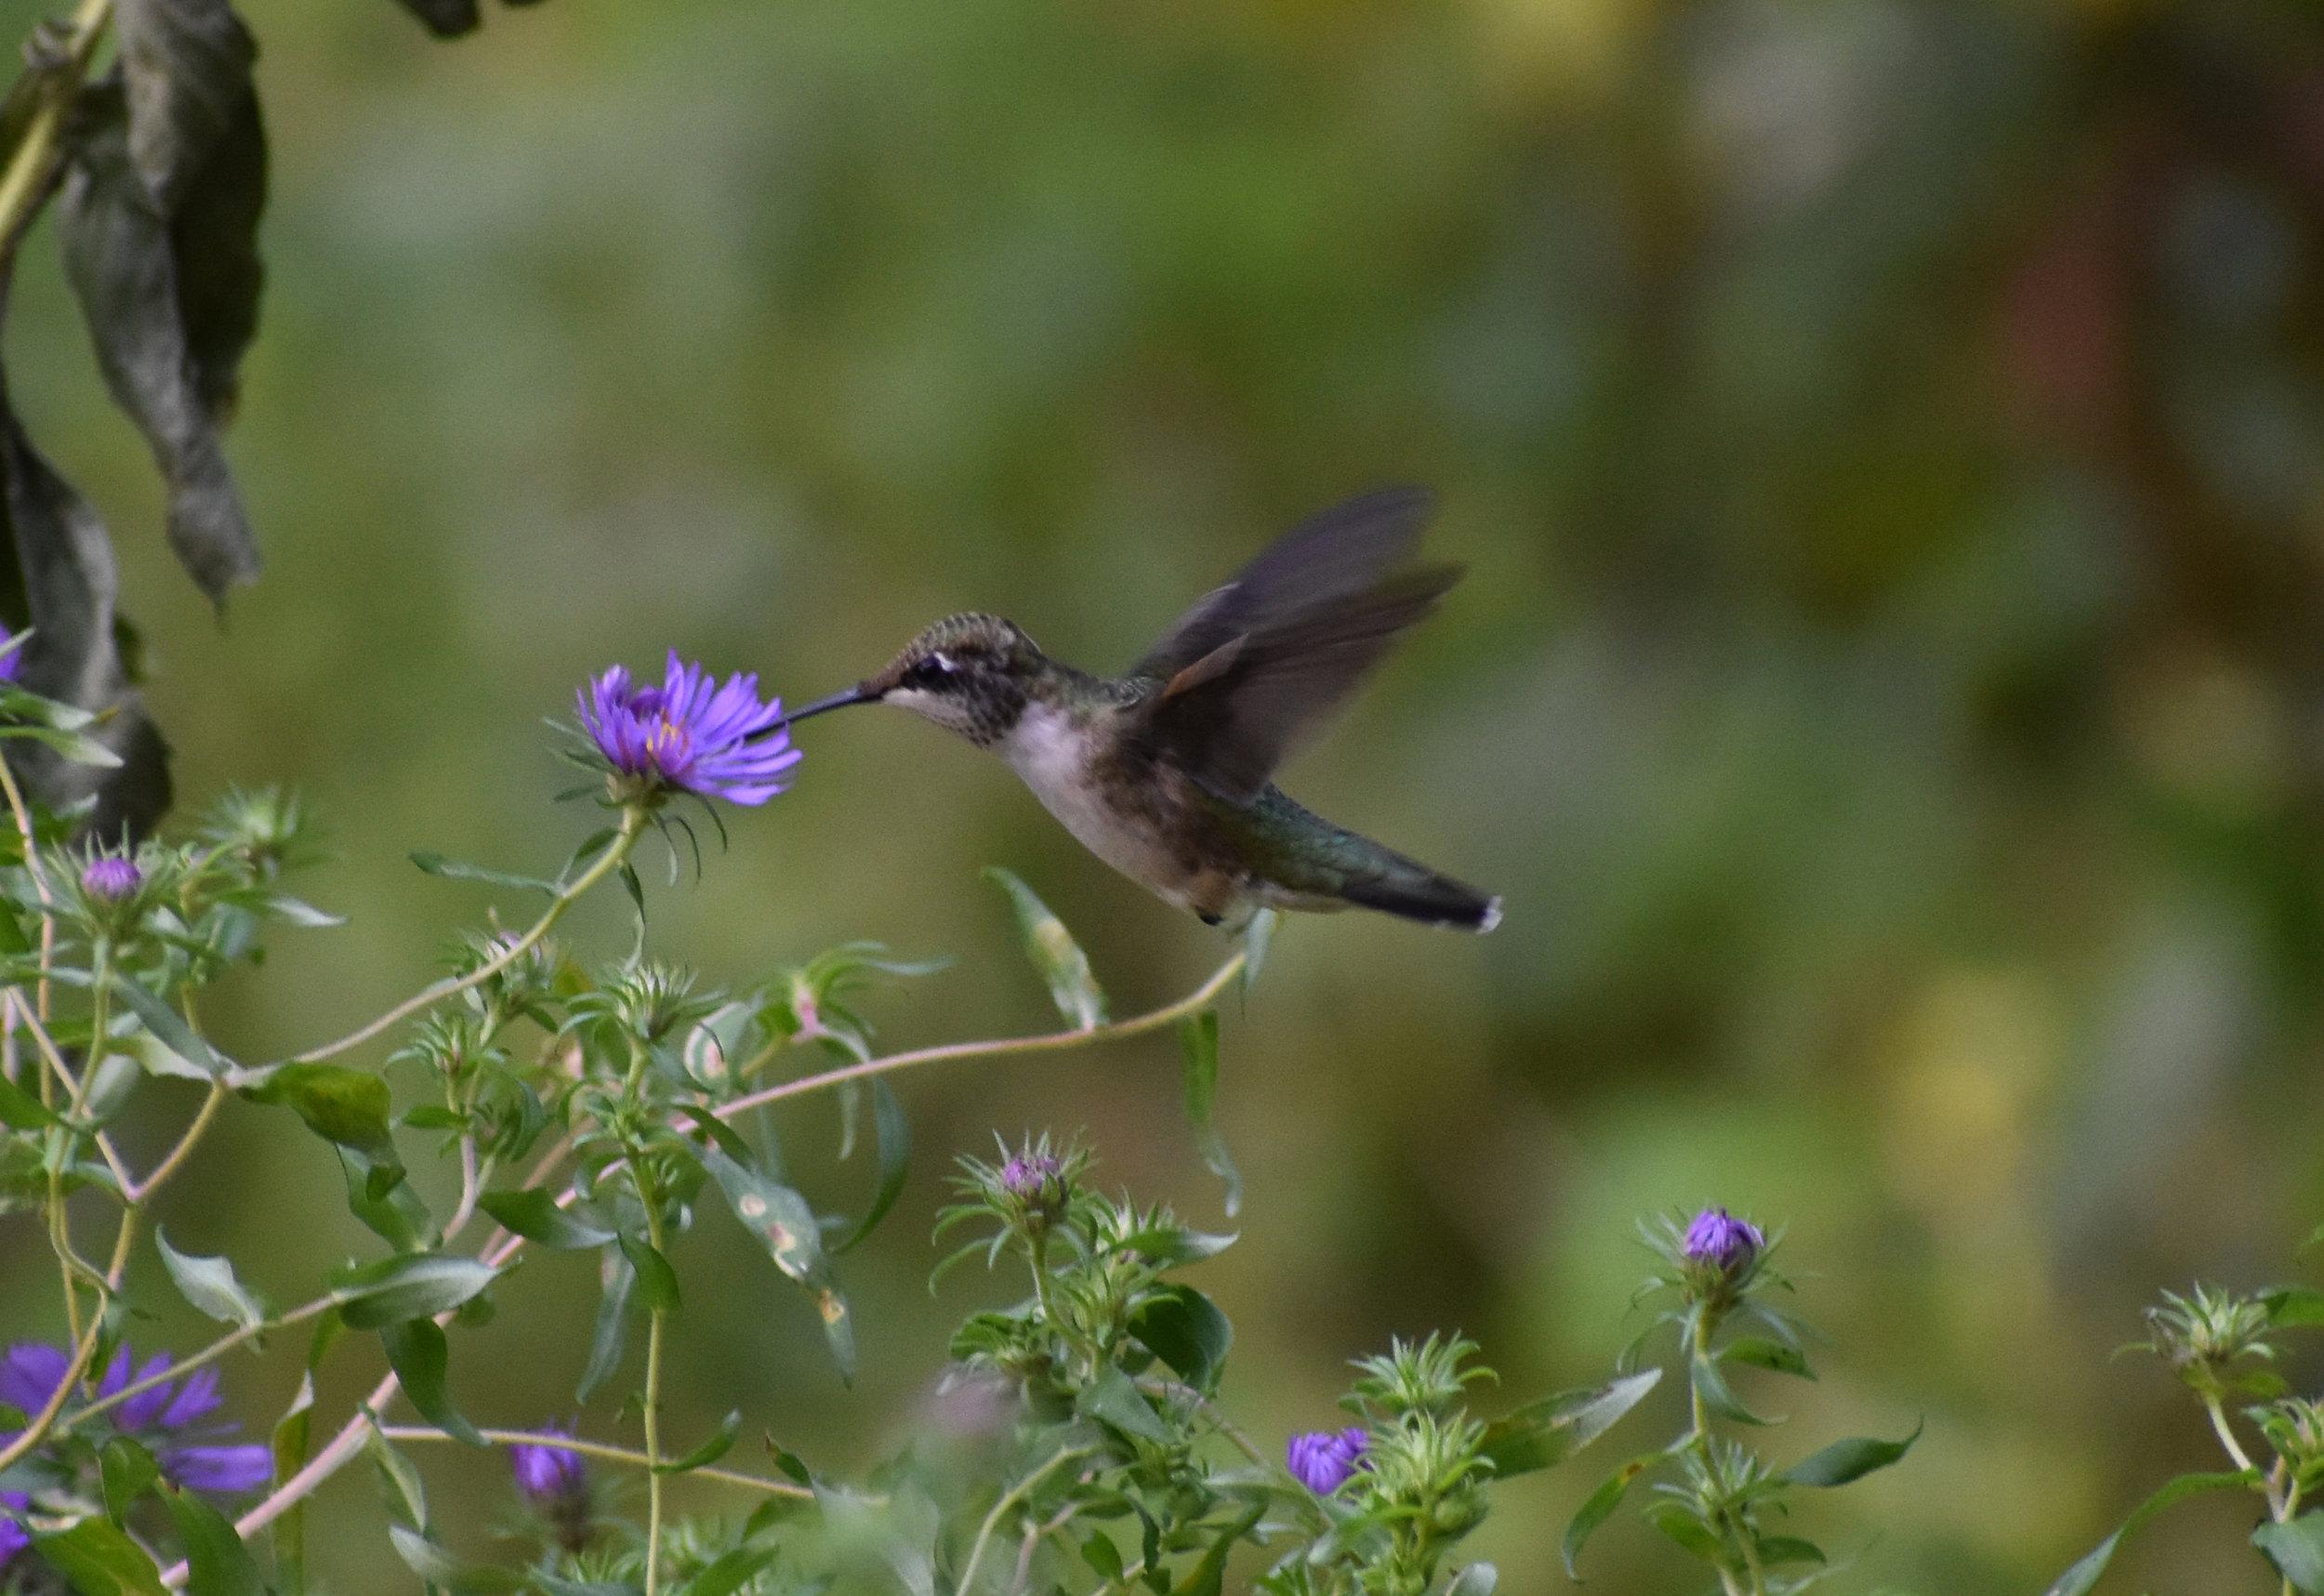 Ruby-Throated Hummingbird & New England Aster